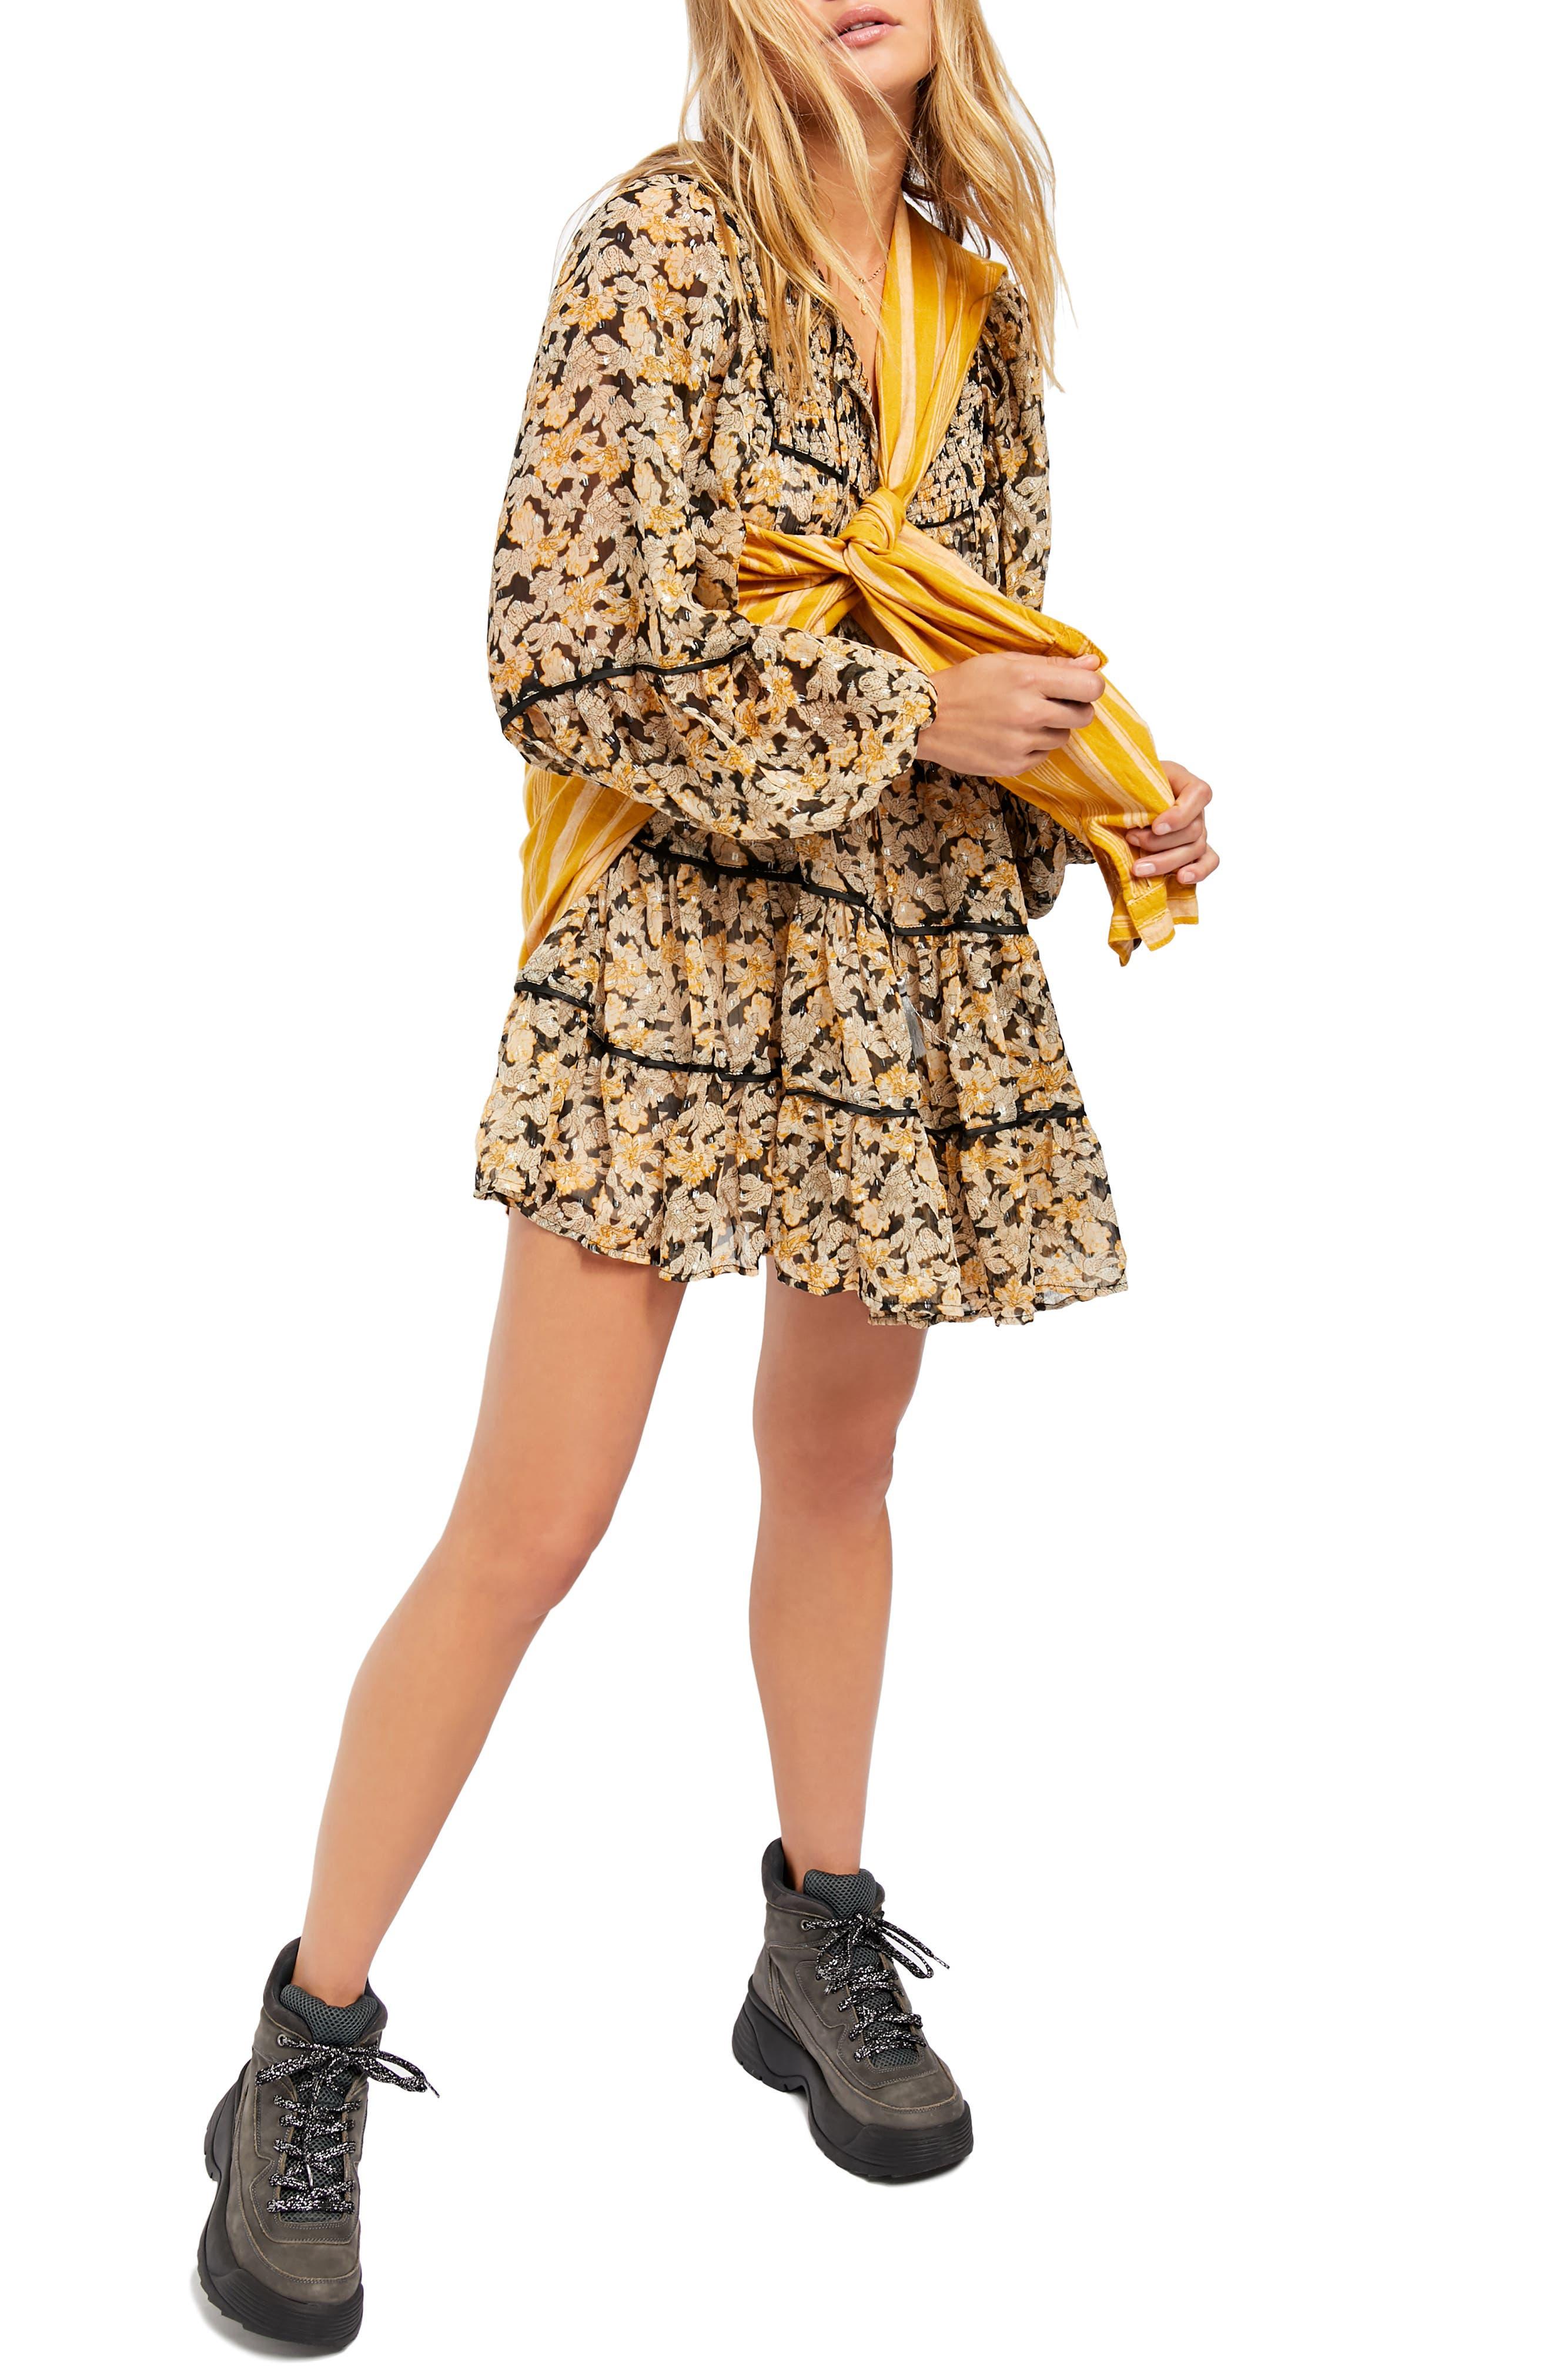 70s Dresses – Disco Dress, Hippie Dress, Wrap Dress Womens Free People Swinging Long Sleeve Tunic Dress $76.80 AT vintagedancer.com